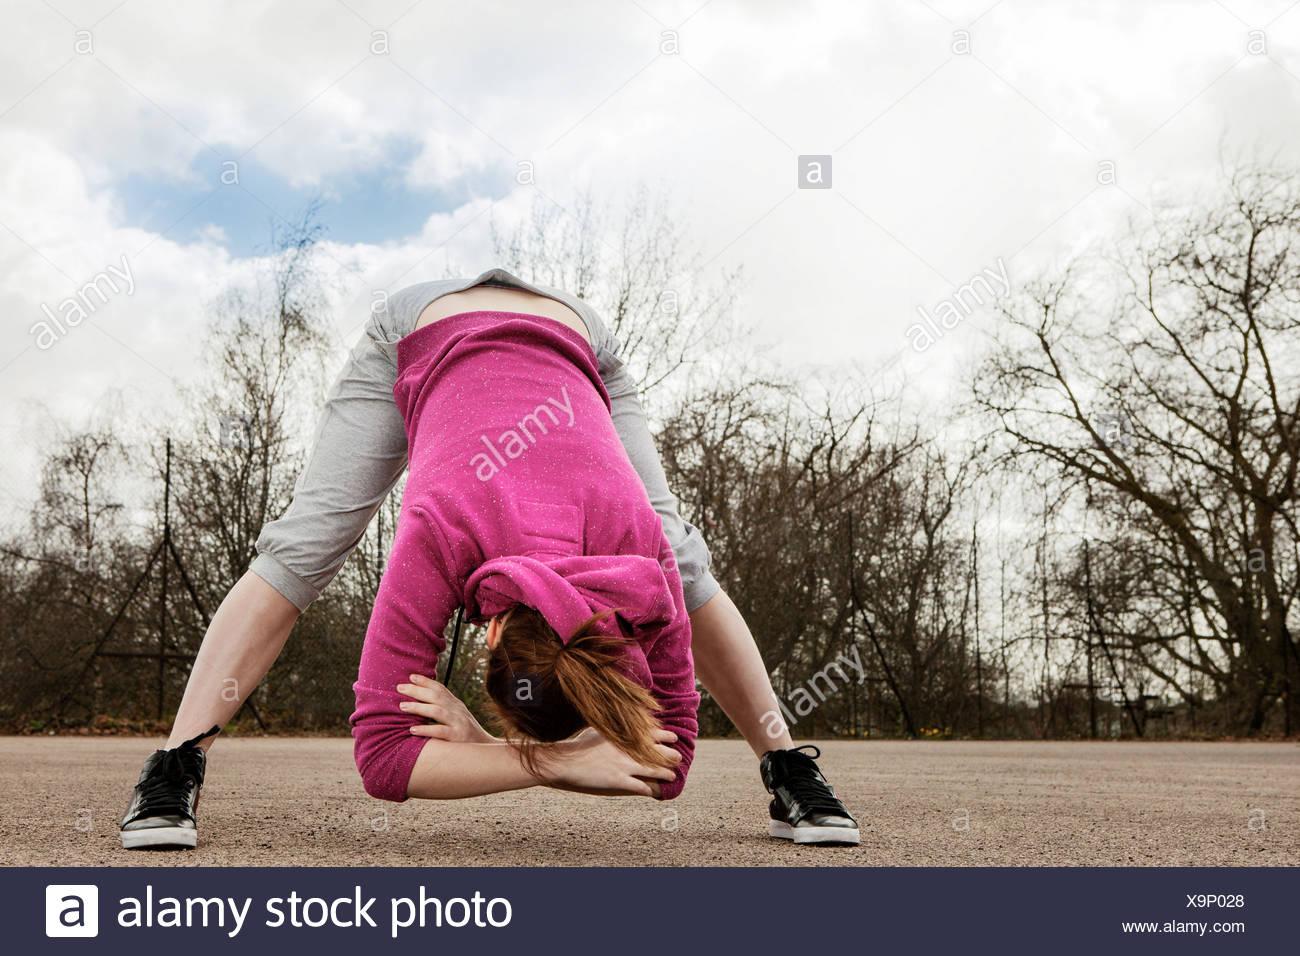 Woman doing bending forward exercise - Stock Image